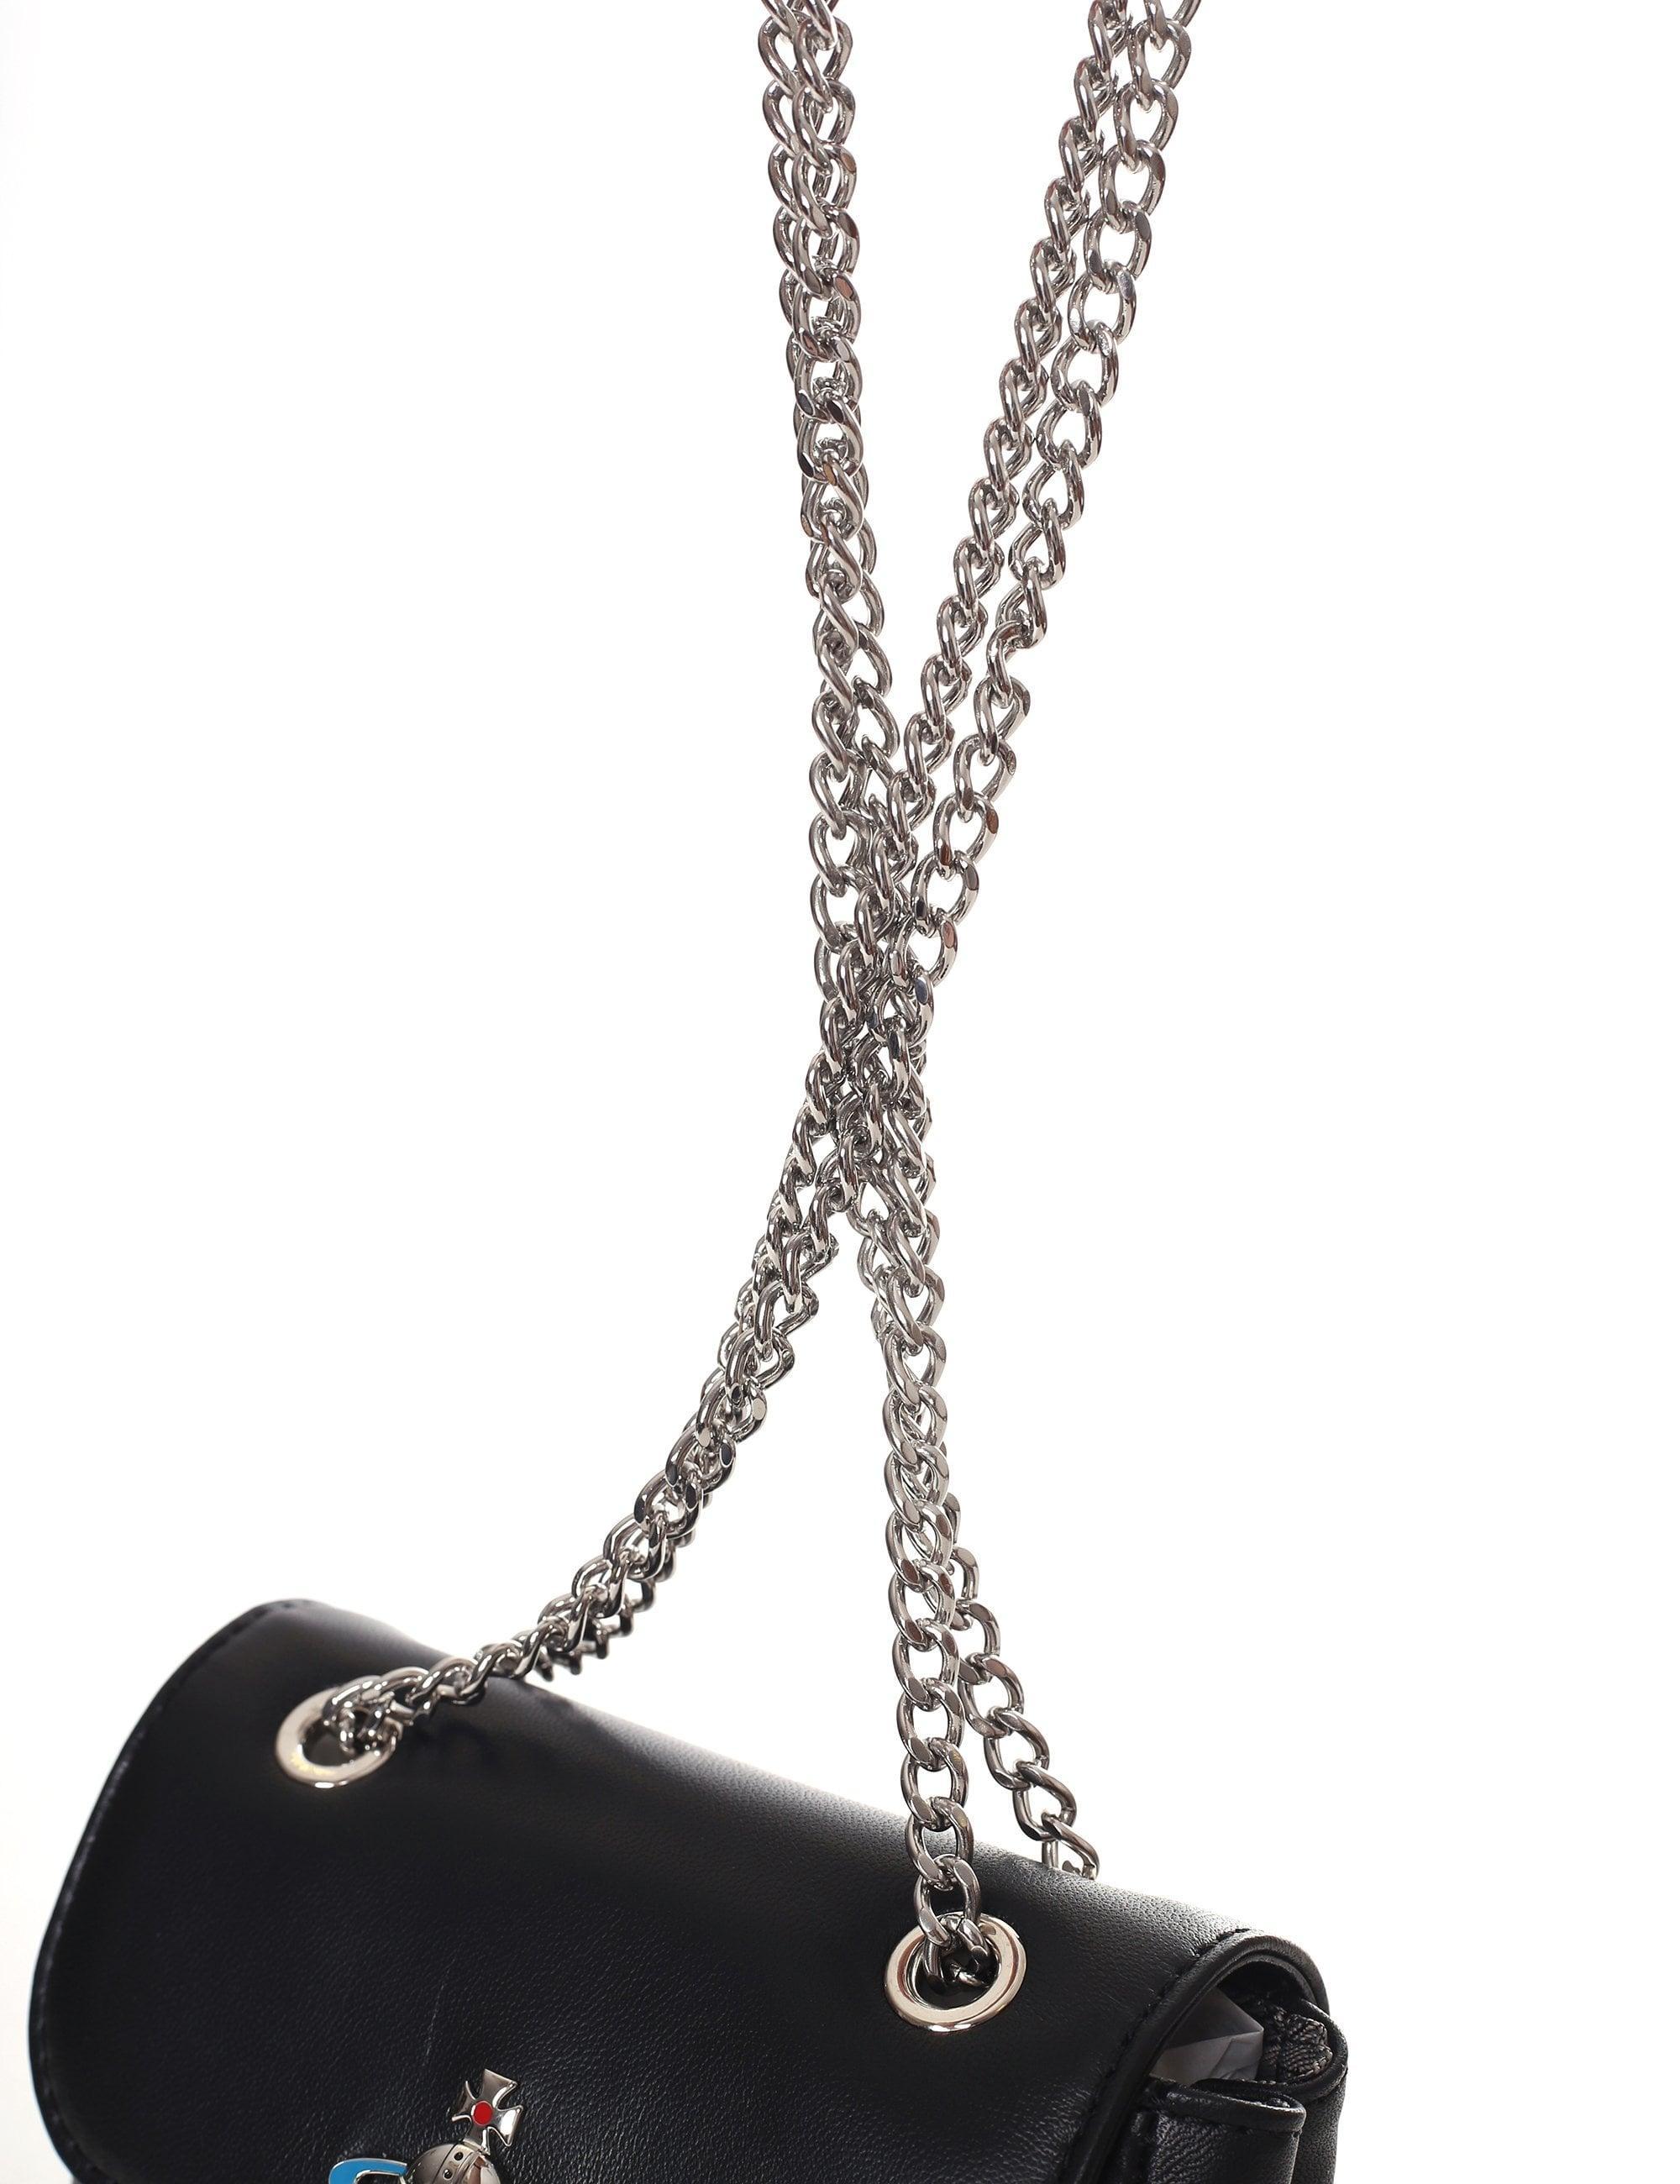 d89ce5096d7 Vivienne Westwood - Women's Emma Small Purse With Chain Black - Lyst. View  fullscreen